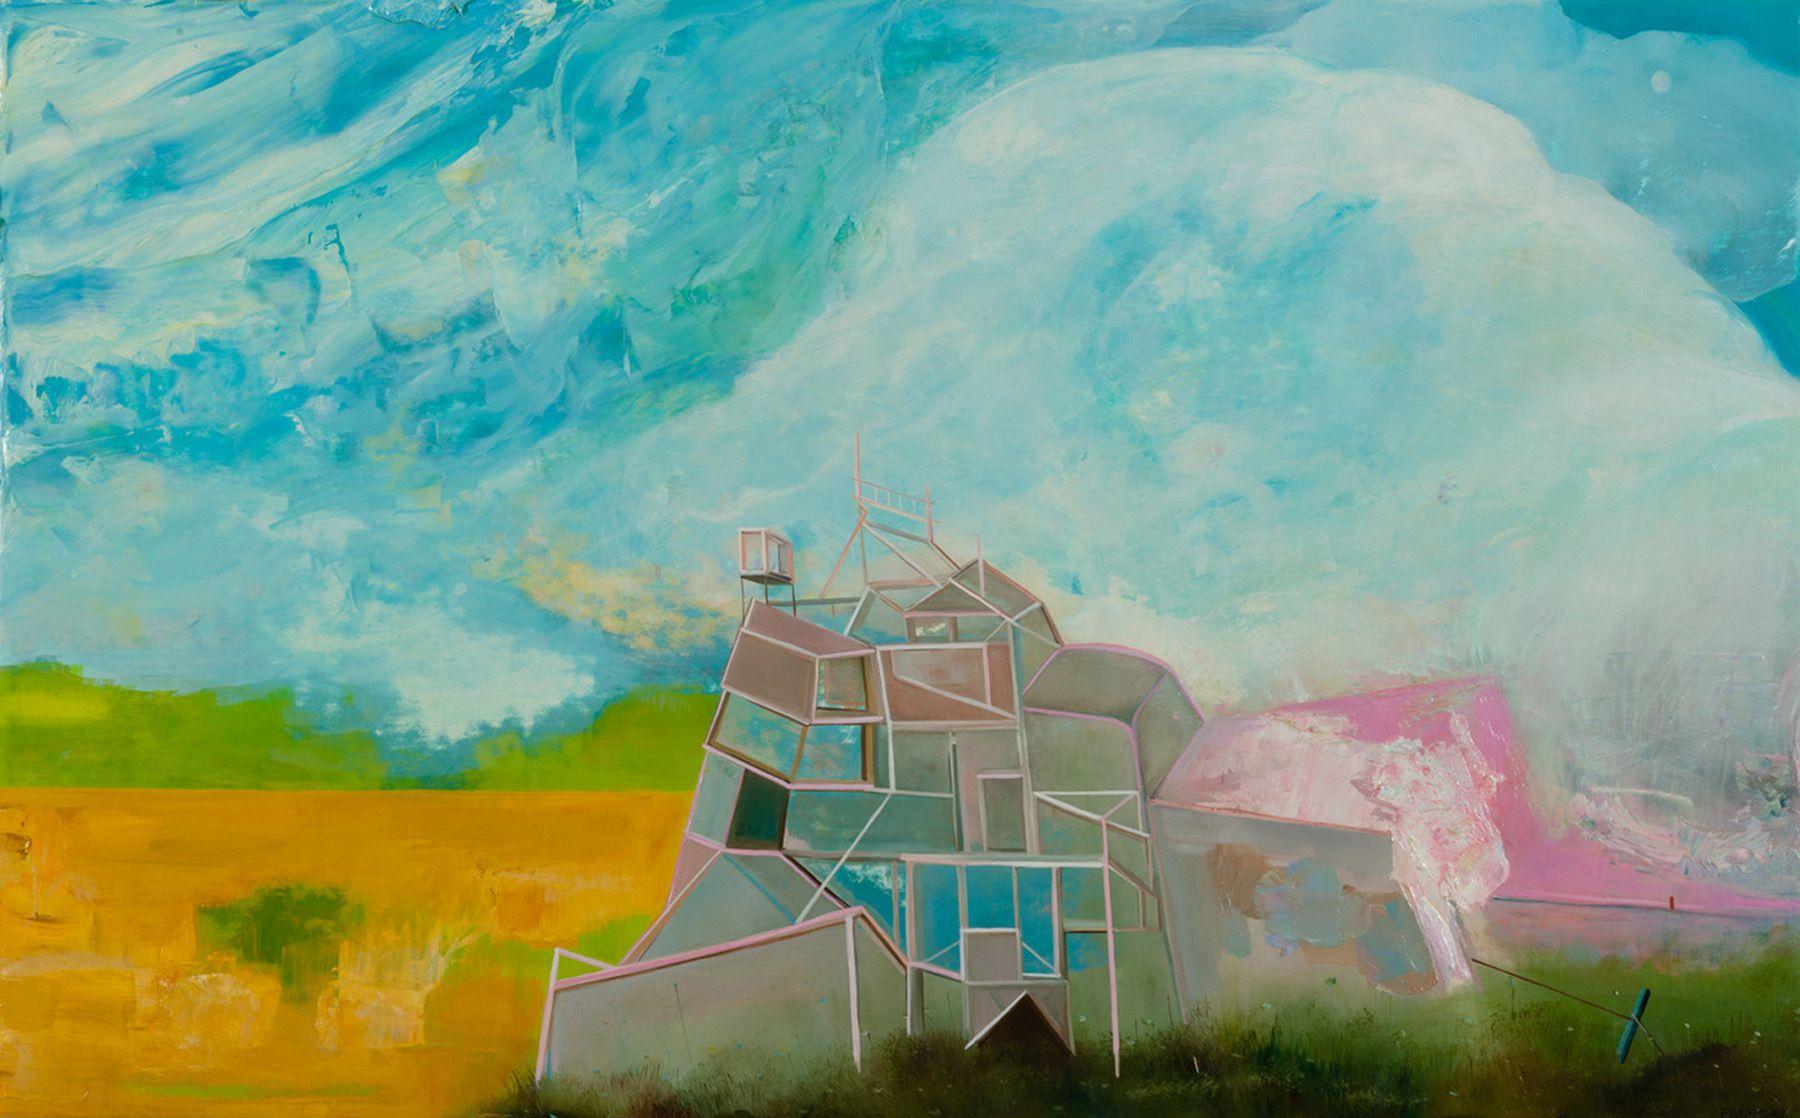 Artist Dwelling #1